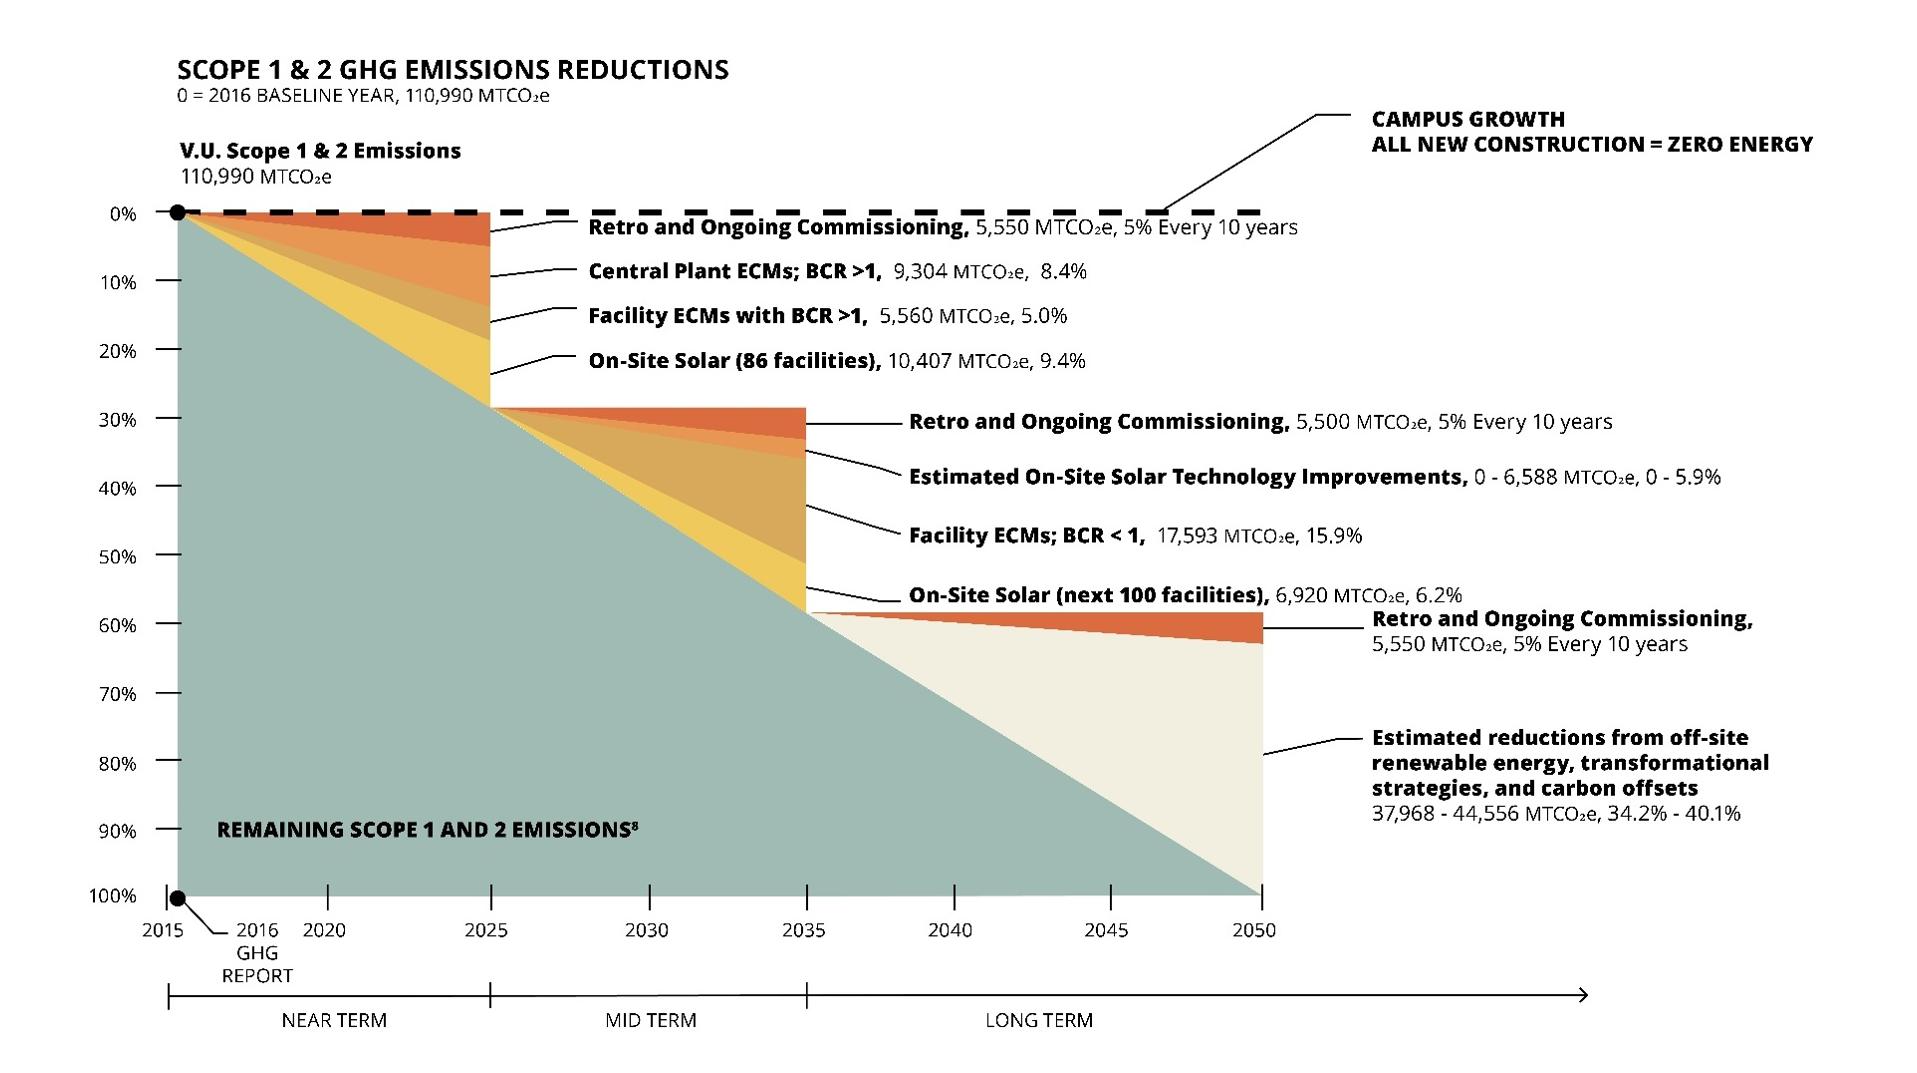 Emissions Reduction Diagram